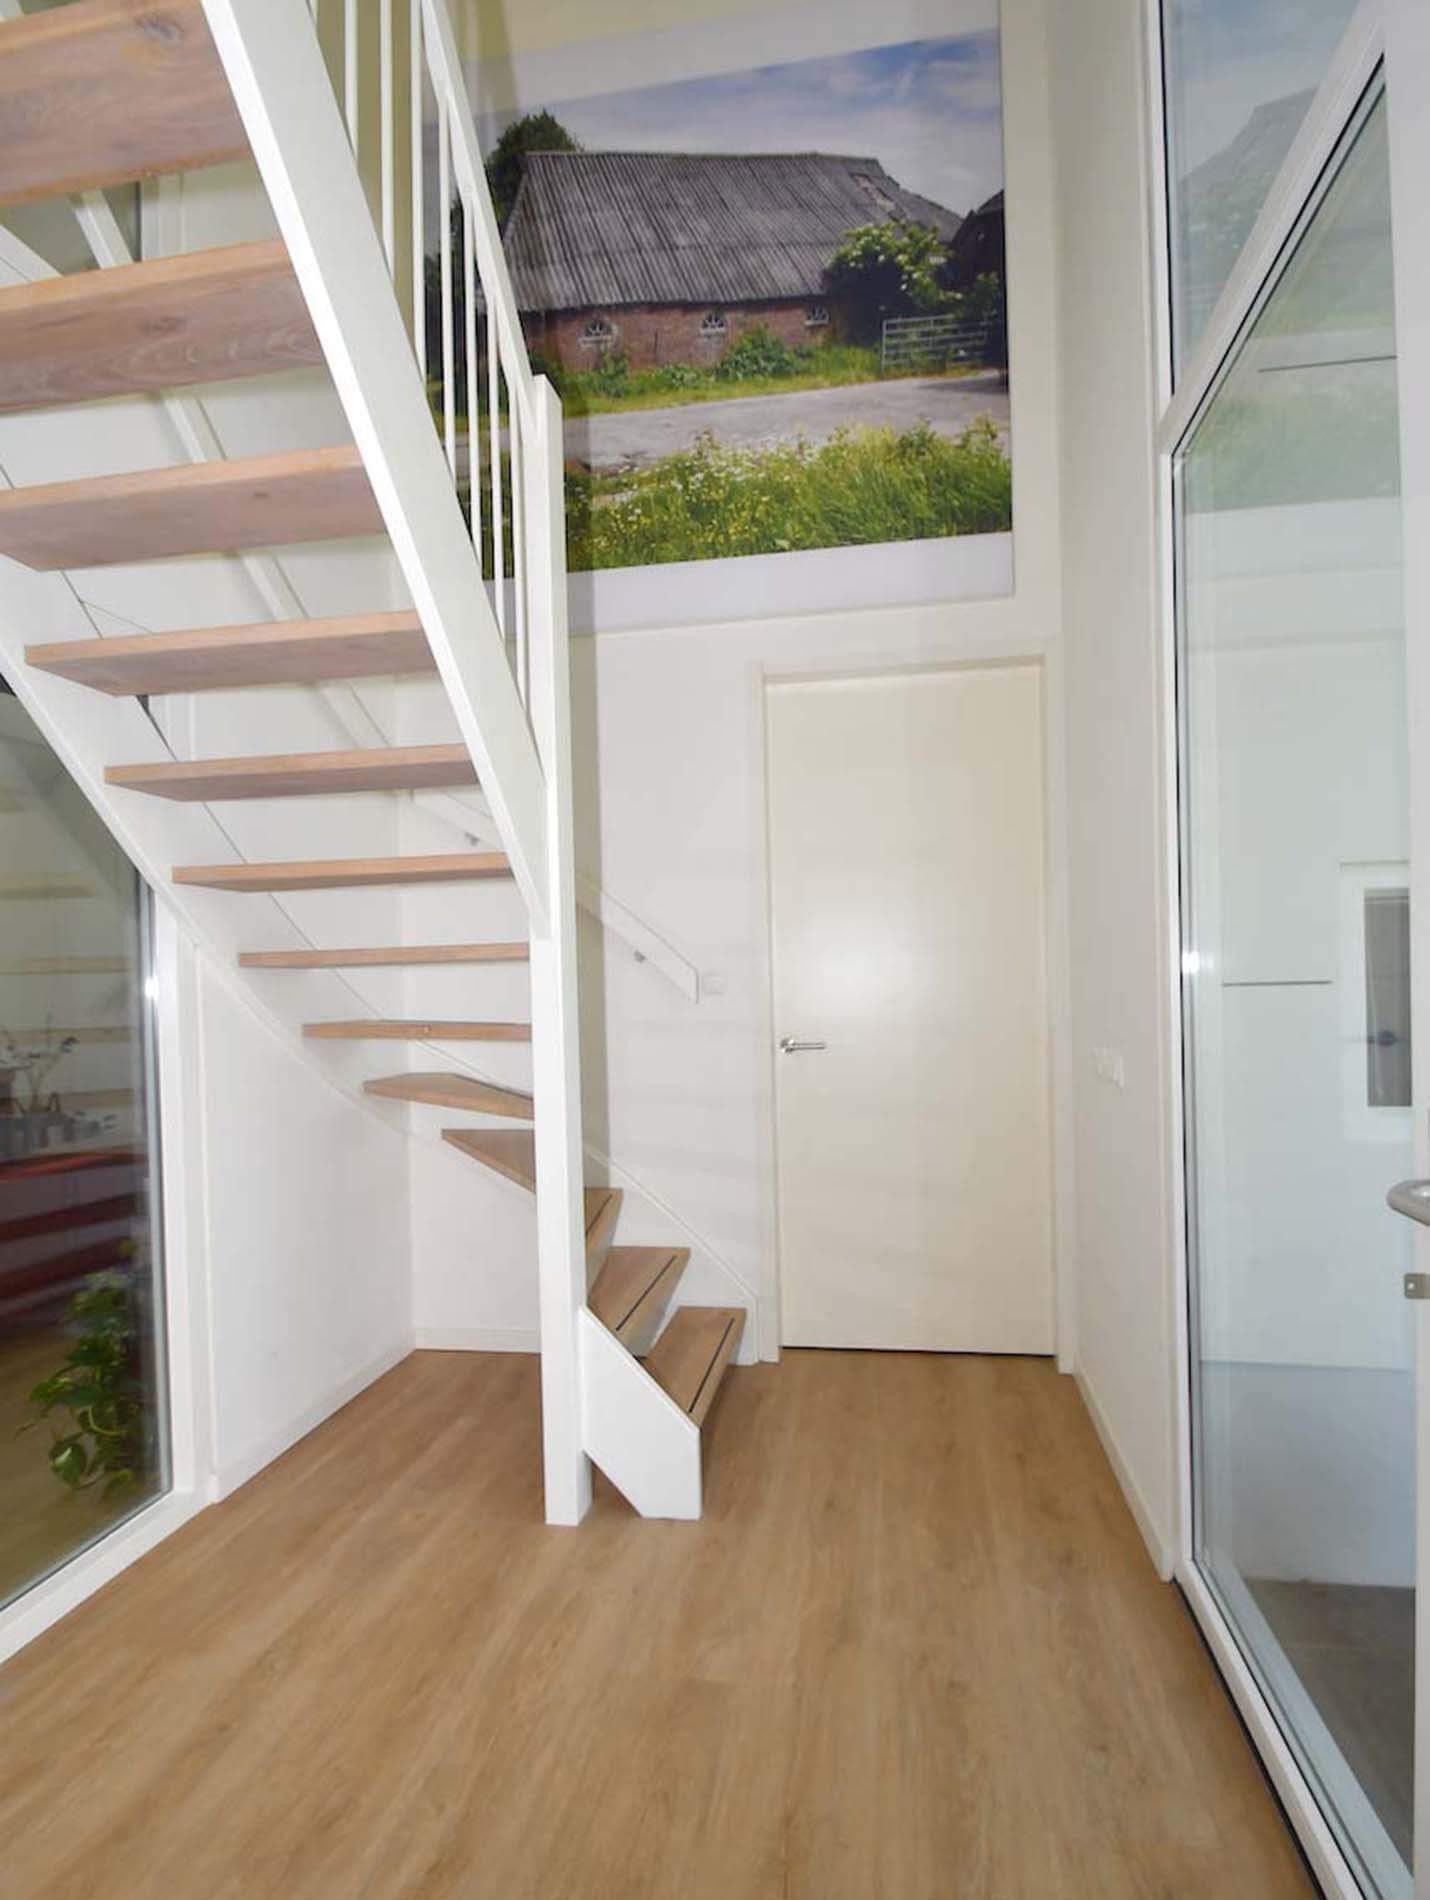 3. Wijnjewoude-particuliere-woning-interieur-1900x1430p.jpg